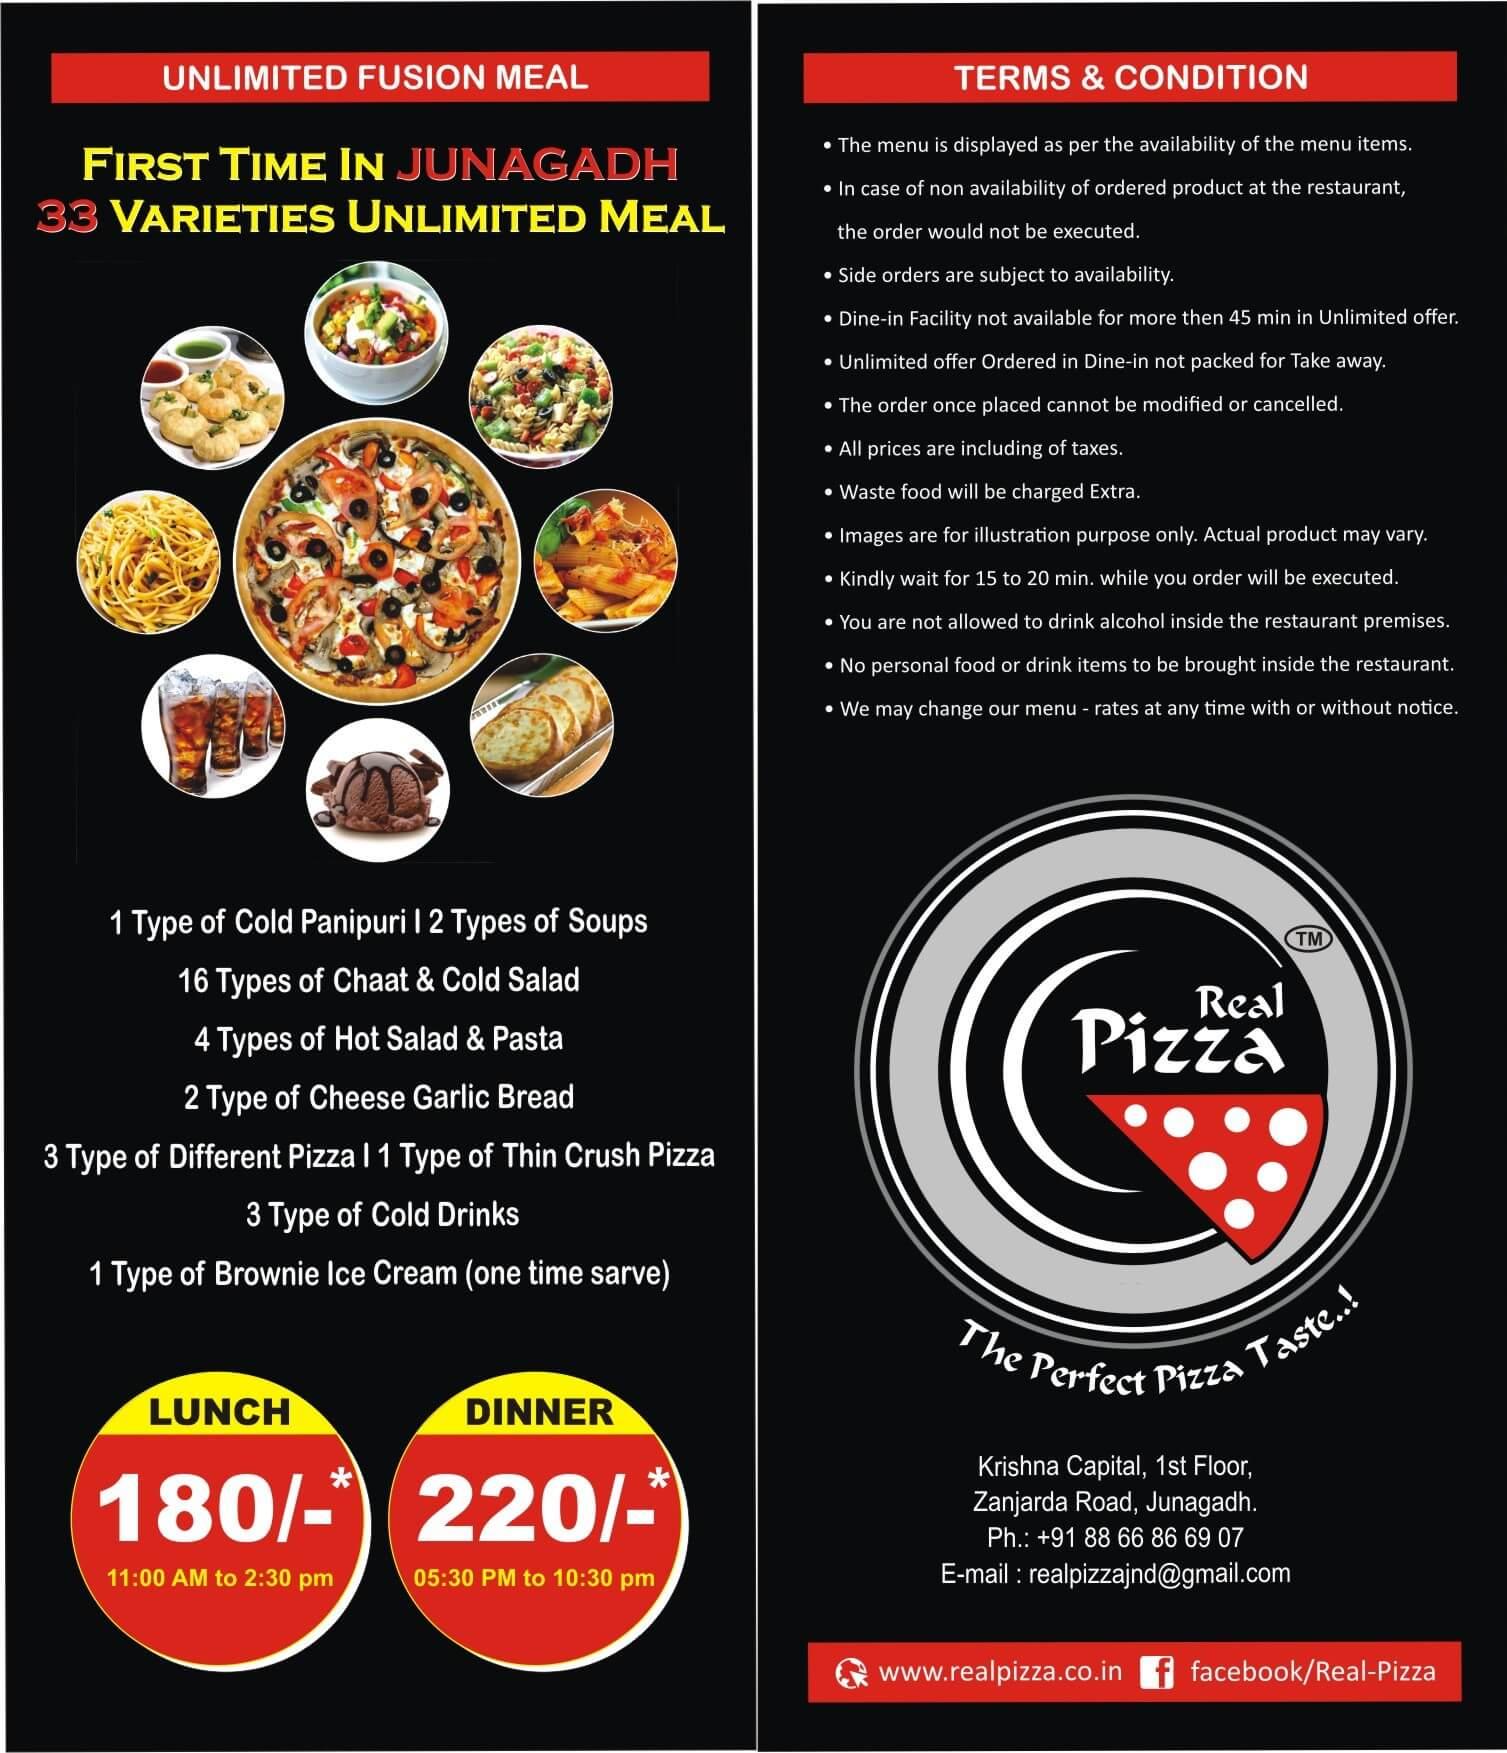 Real Pizza Junagadh